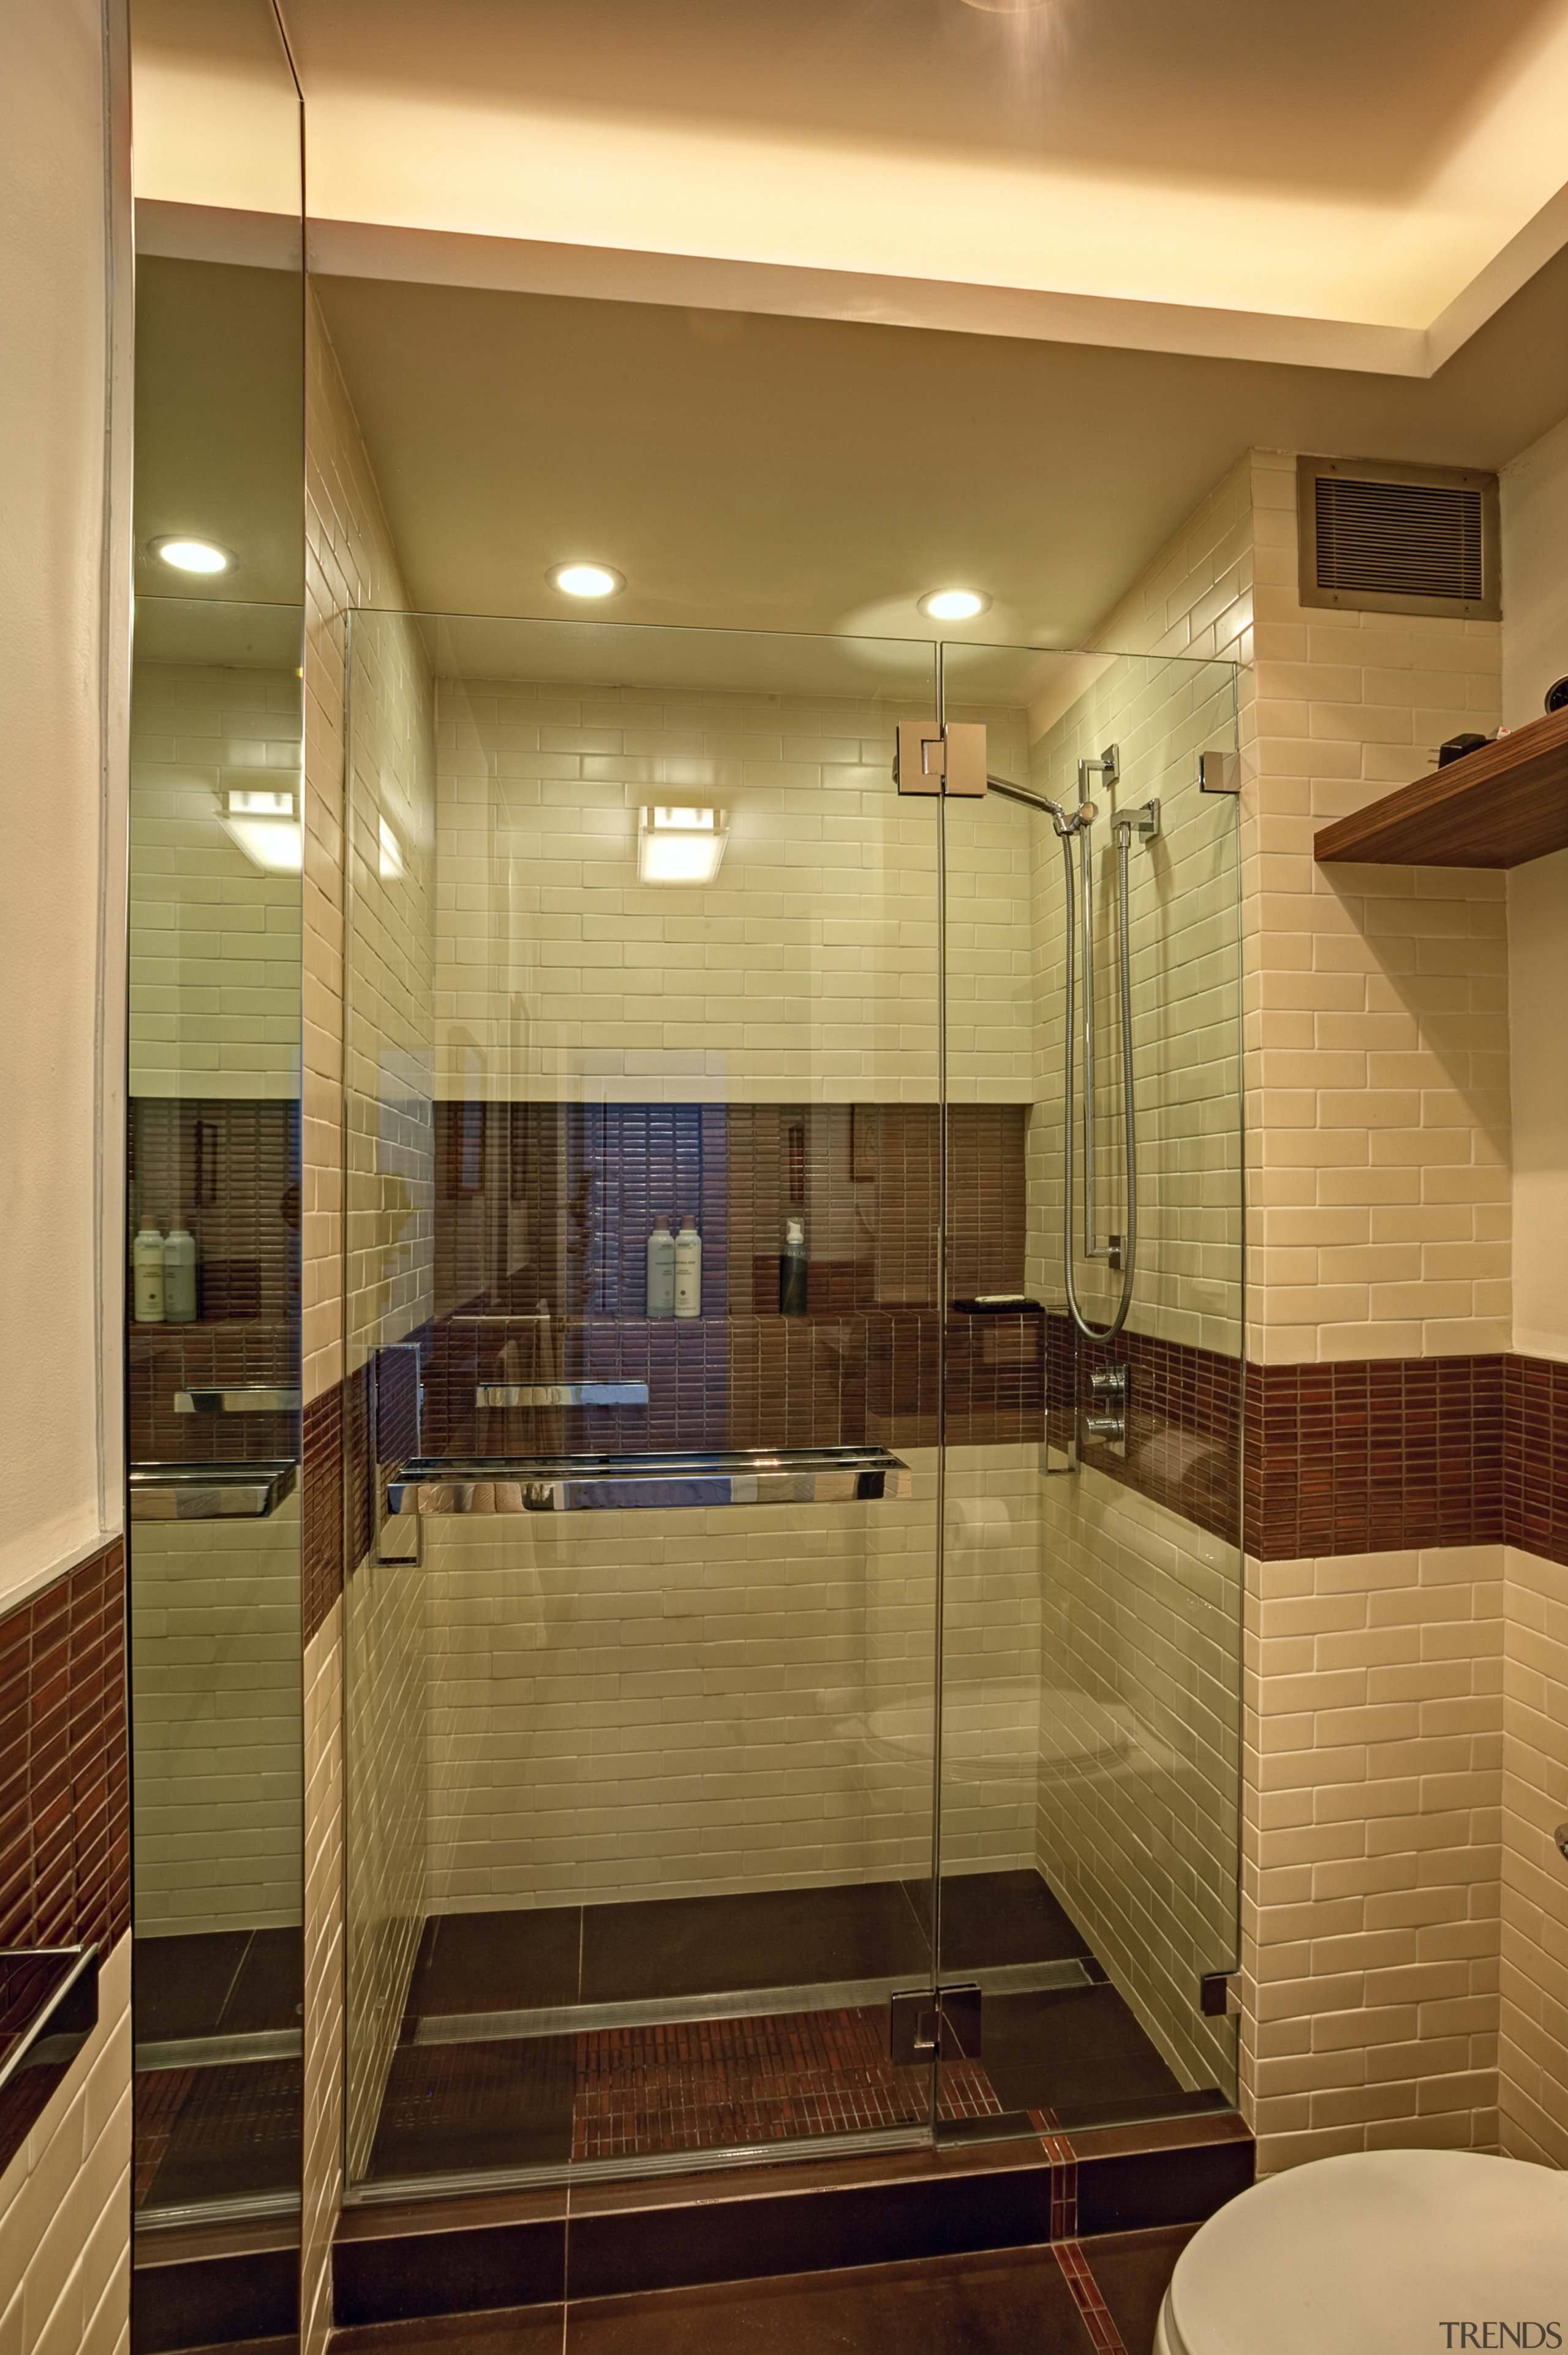 Craftsman-style tilework creates visual interest in this wheelchair-friendly architecture, bathroom, ceiling, estate, floor, flooring, glass, home, interior design, room, tile, wood, brown, orange